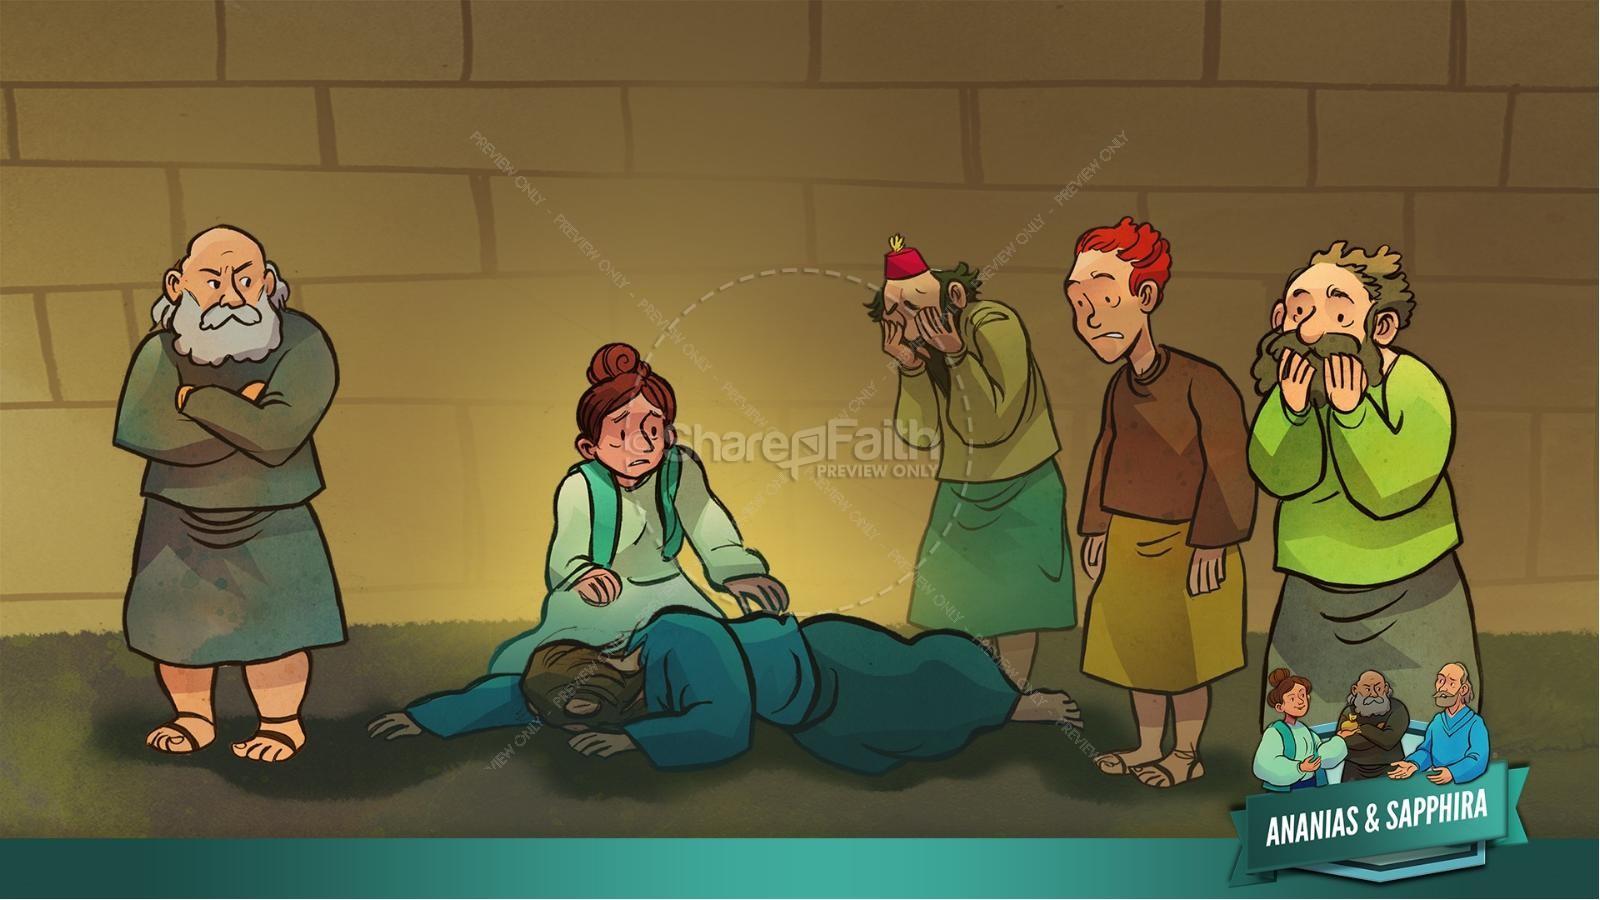 Acts 5 Ananias and Sapphira Kids Bible Stories | slide 24